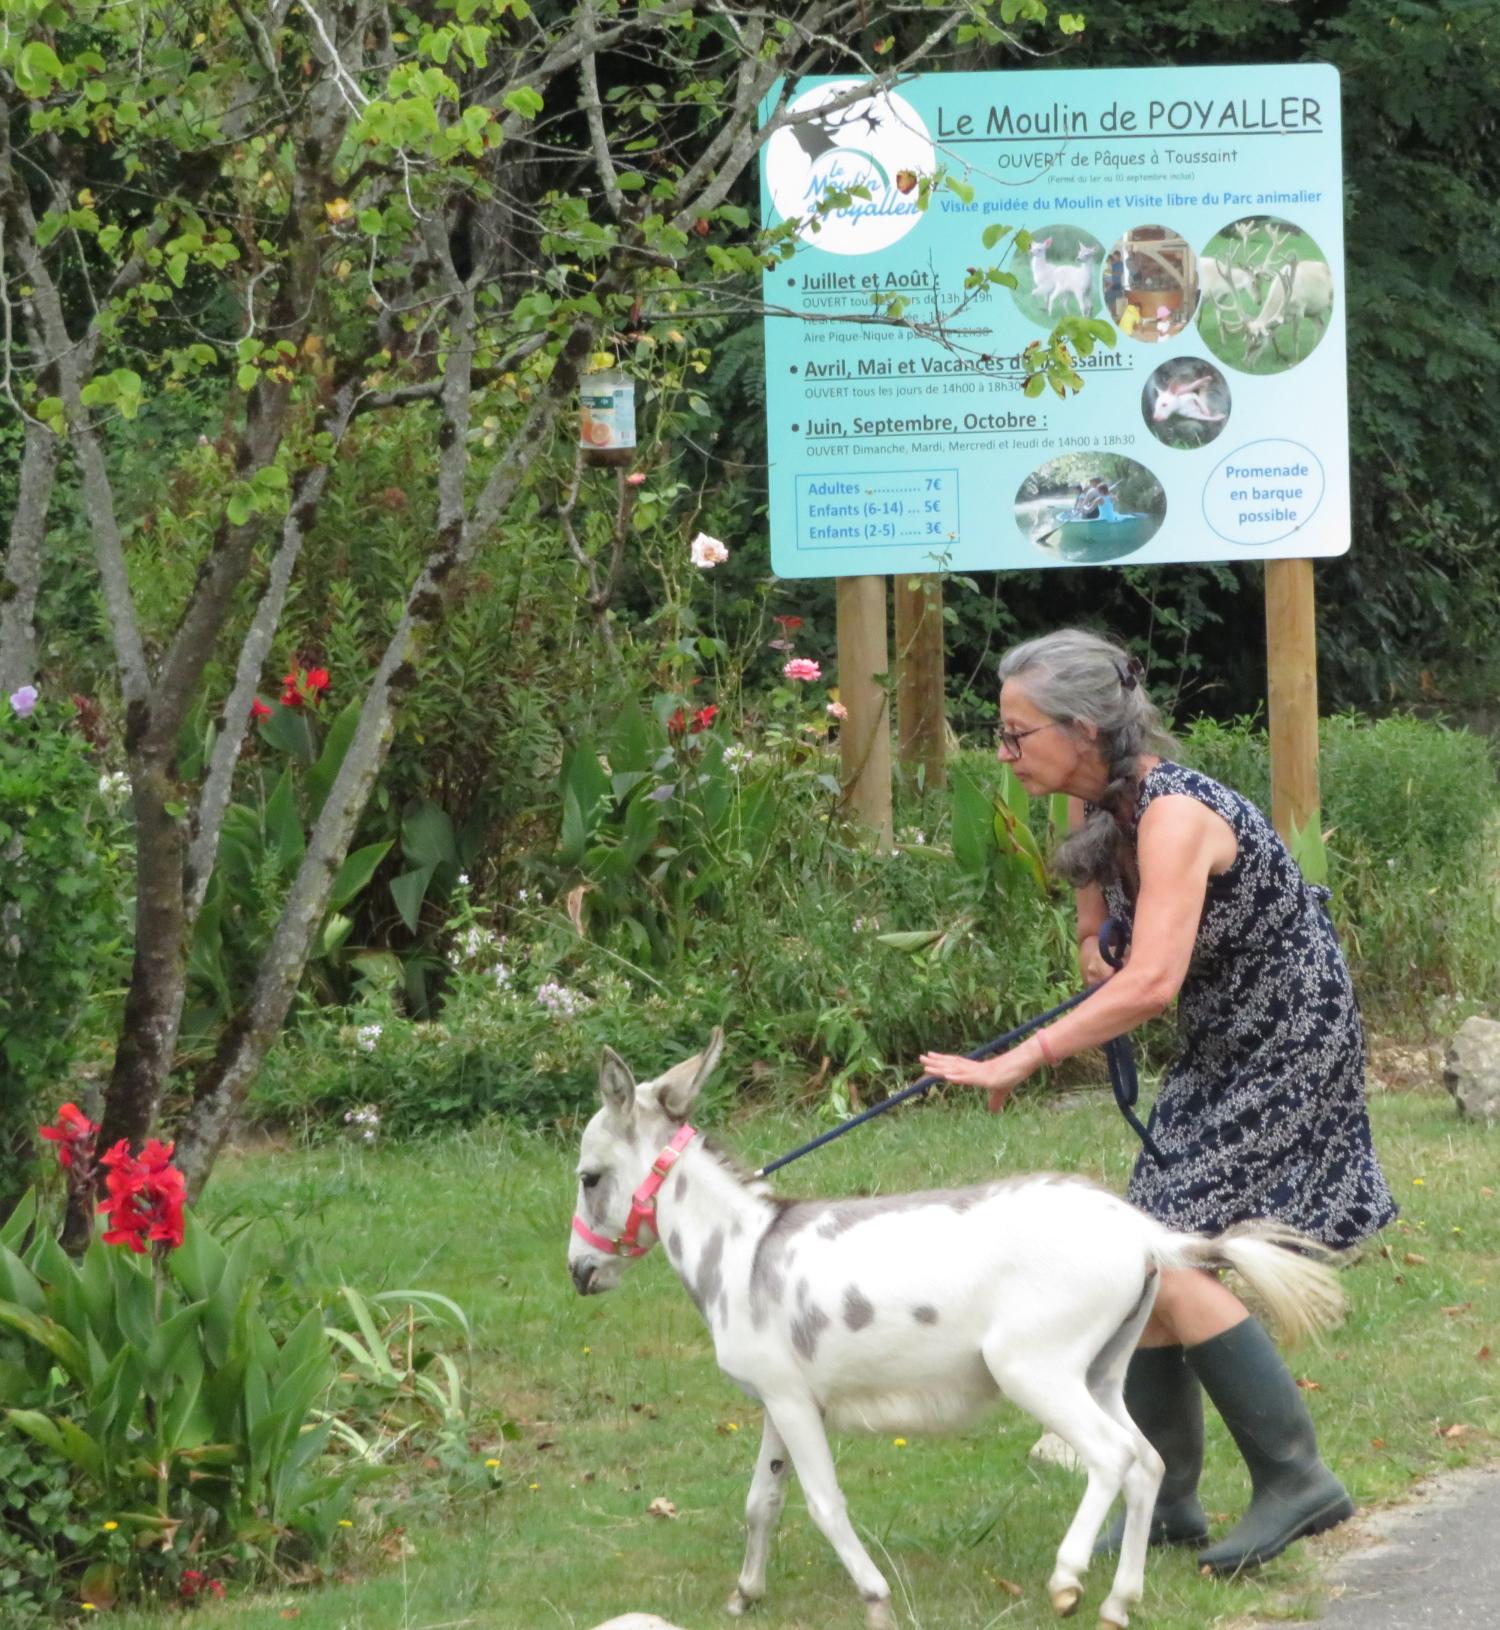 Martine devant le moulin